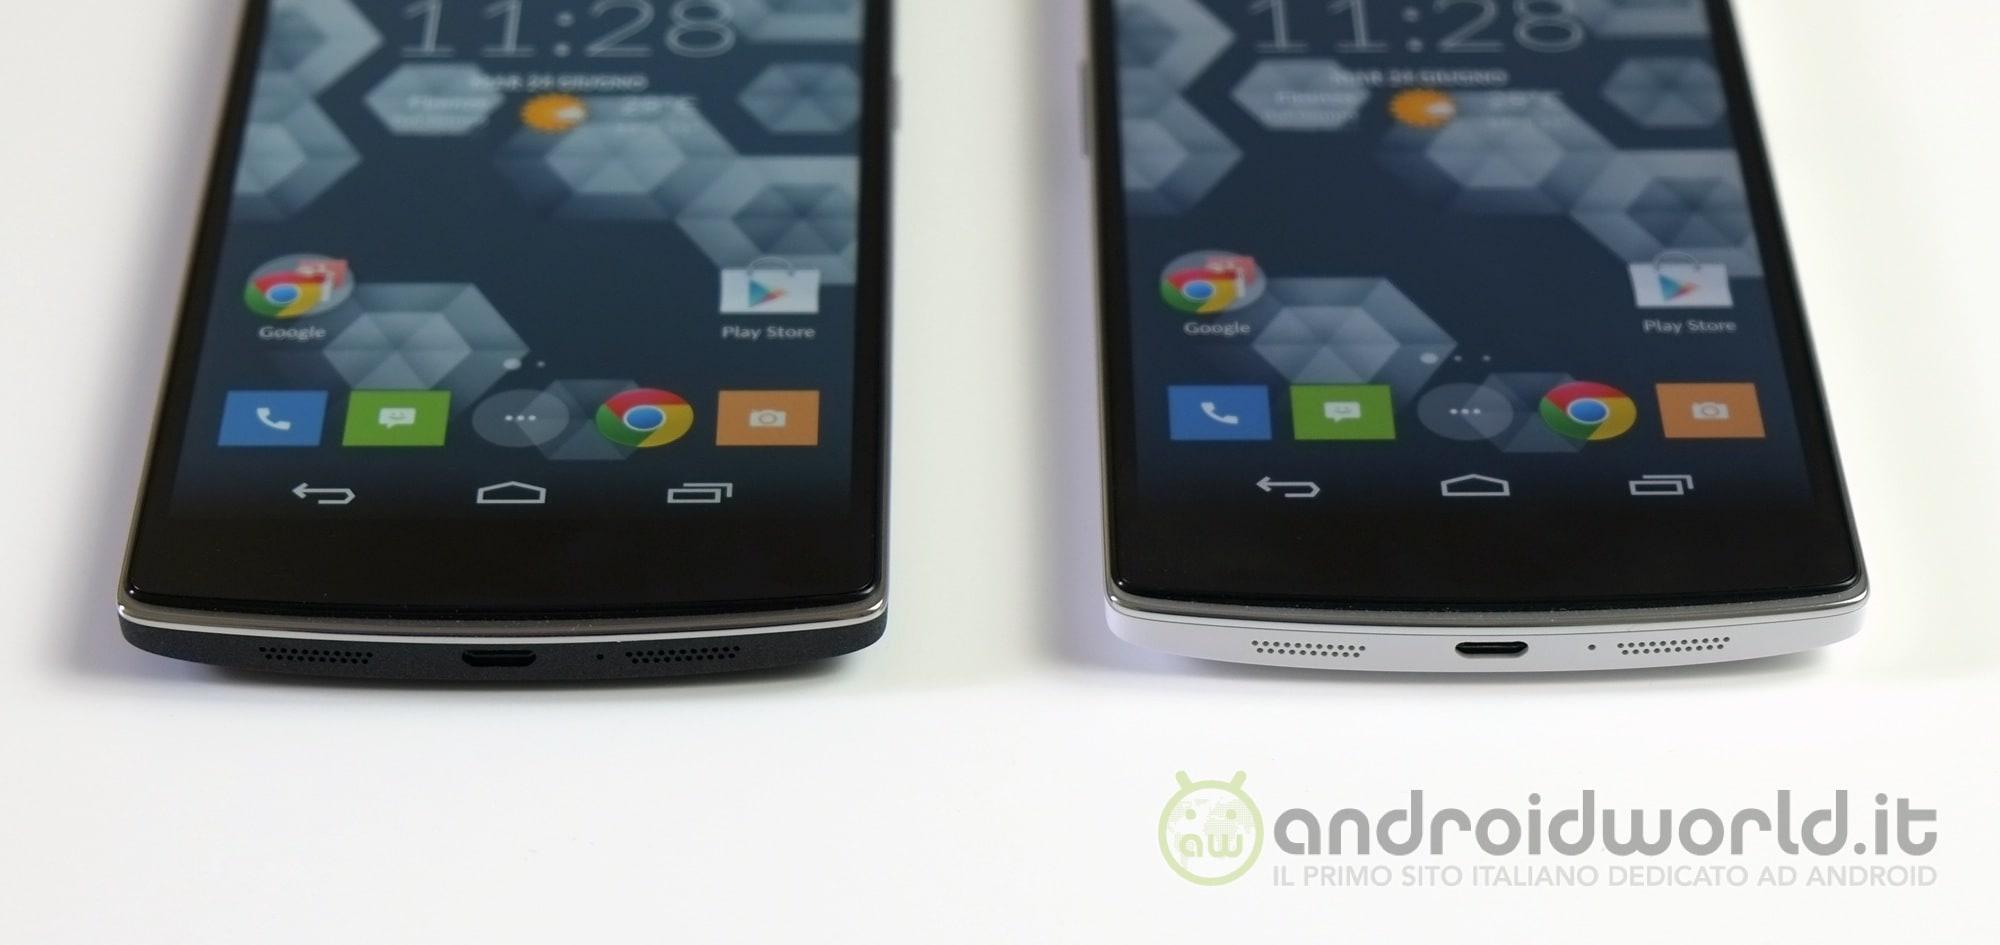 OnePlus One a confronto 3